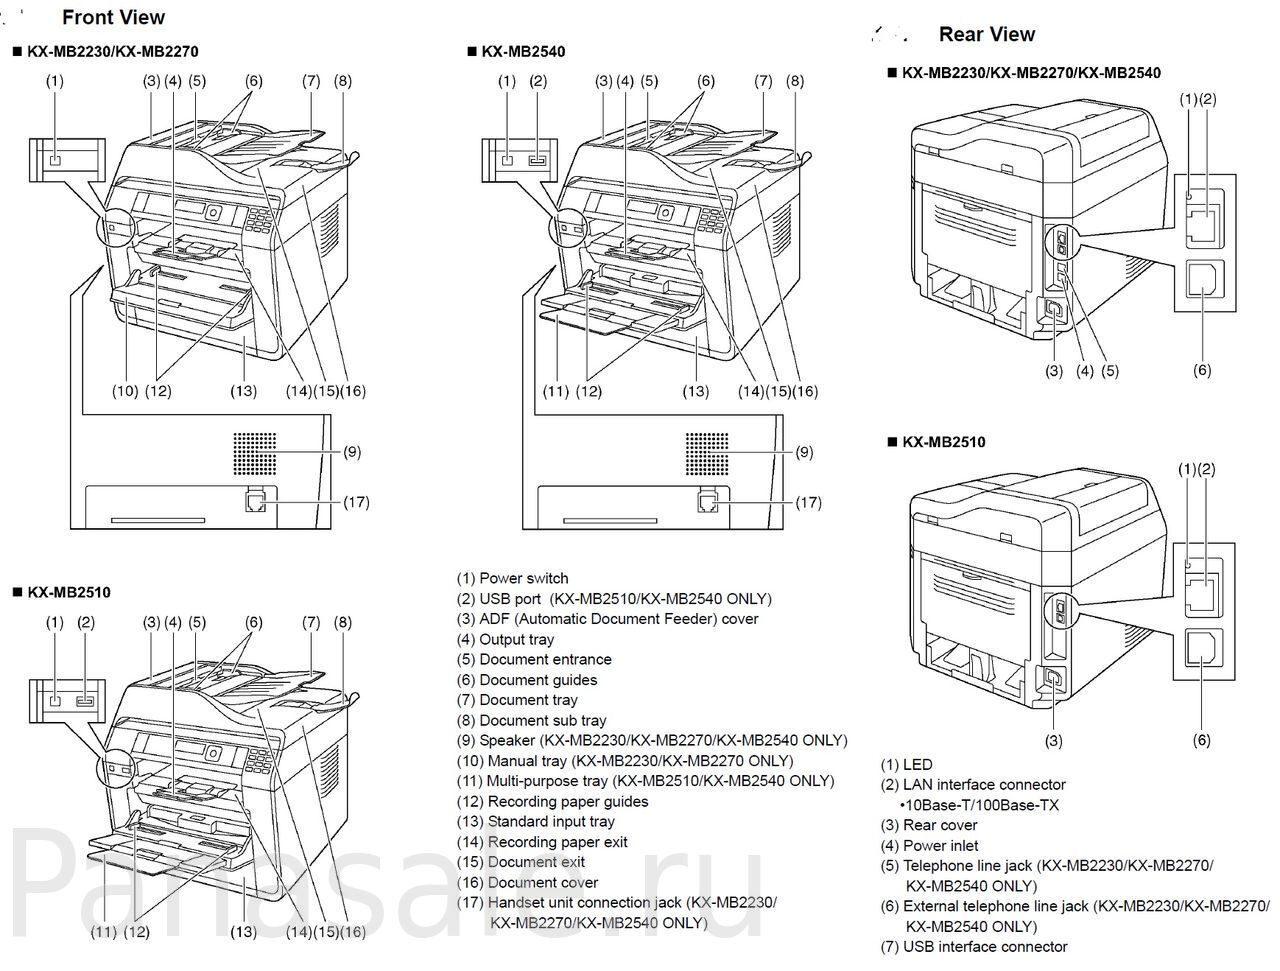 Kx-Mb2270 инструкция